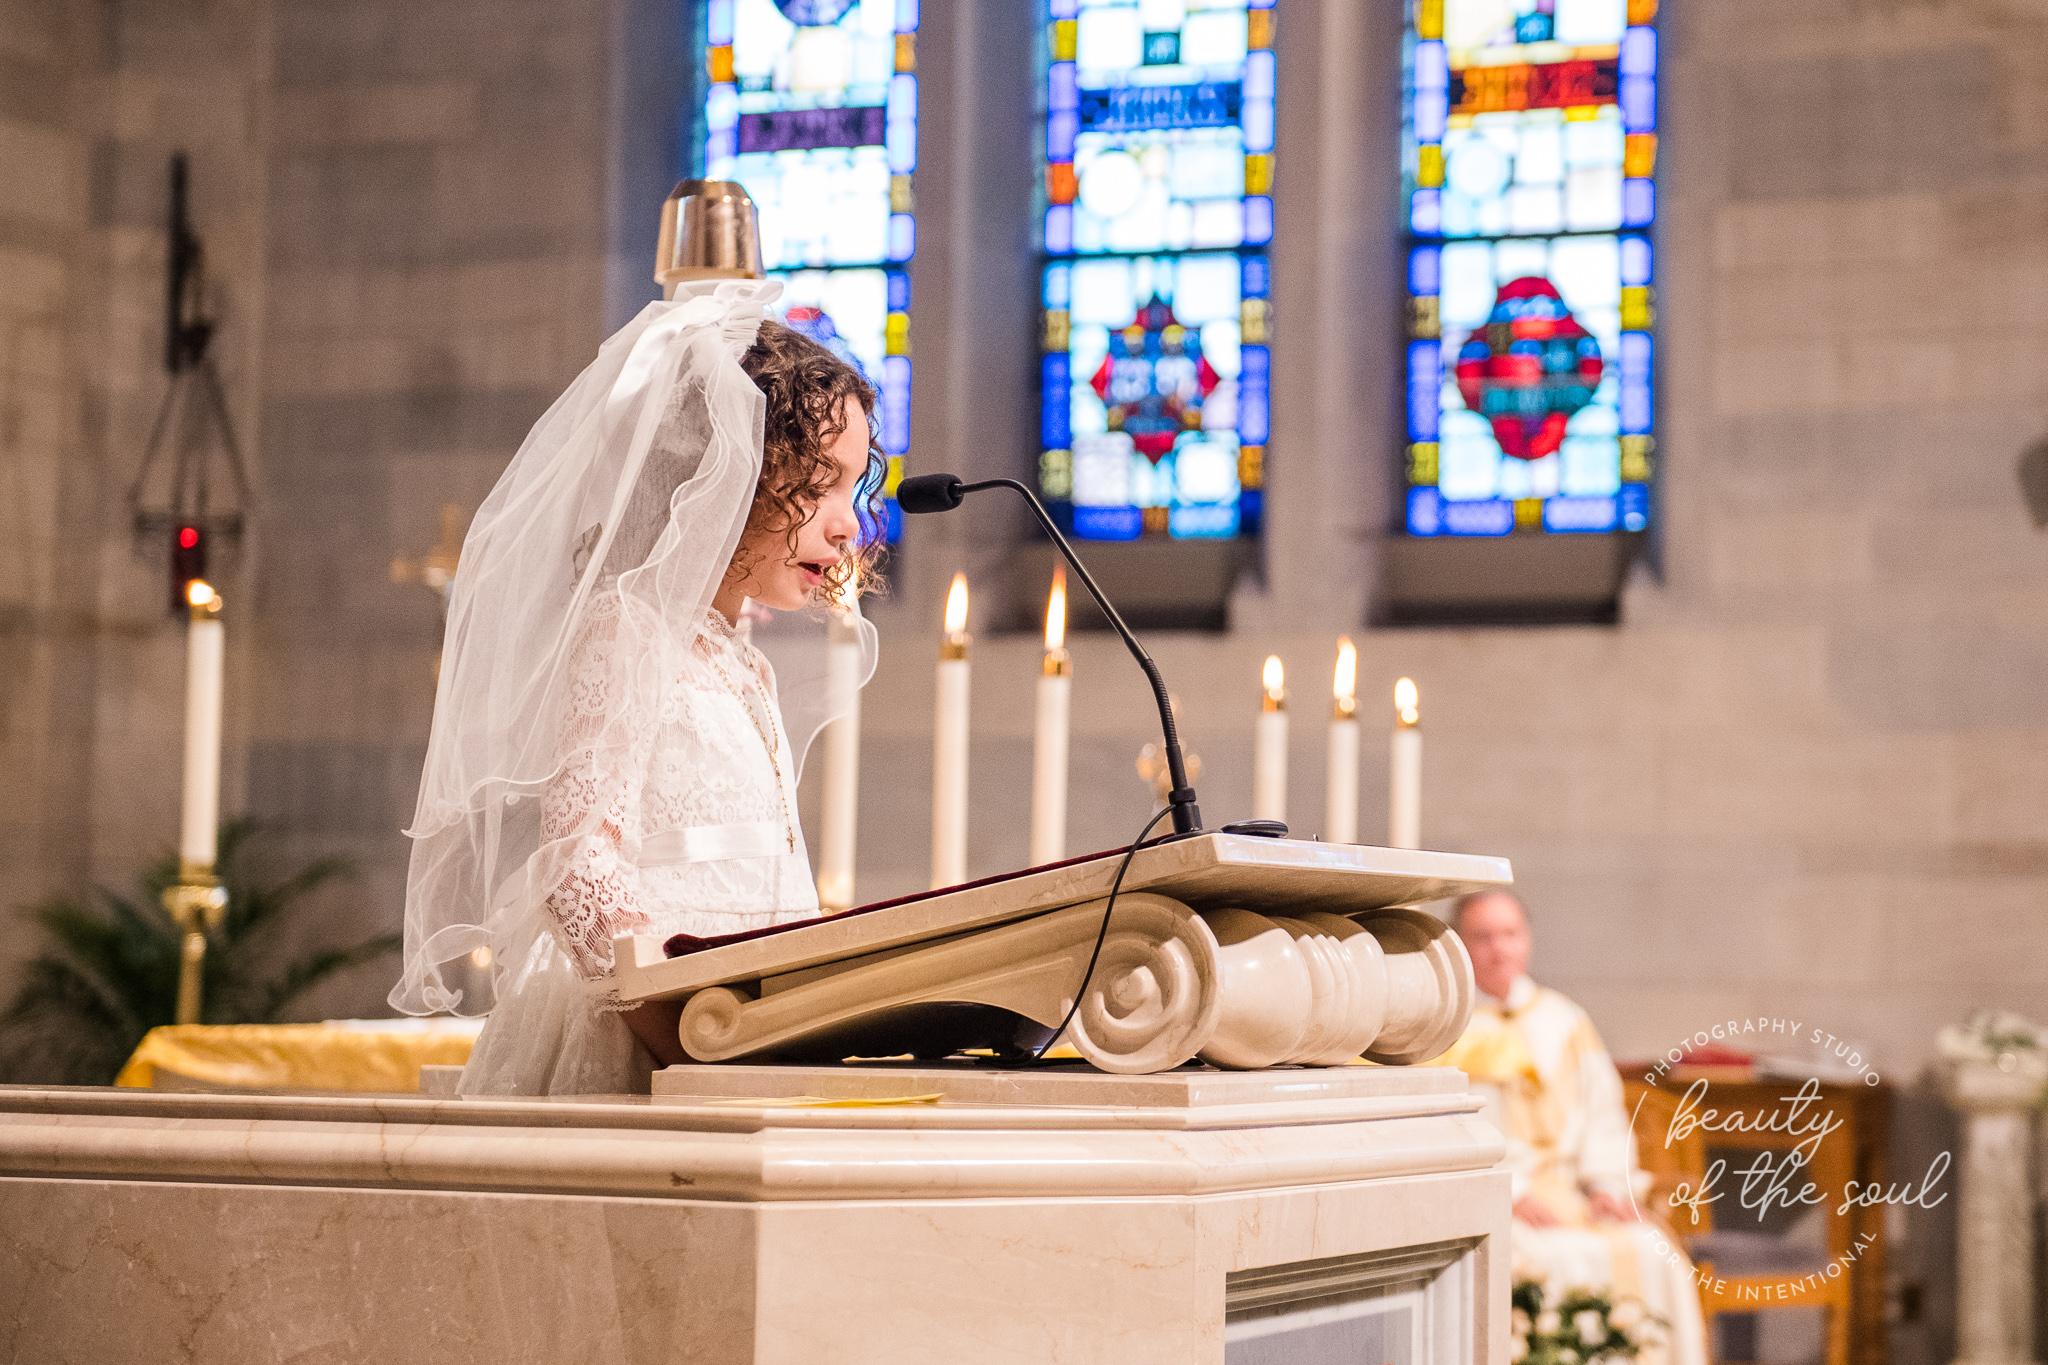 washington-dc-st-ann-catholic-church-first-holy-communion-beauty-of-the-soul-studio-may-2019-06.jpg